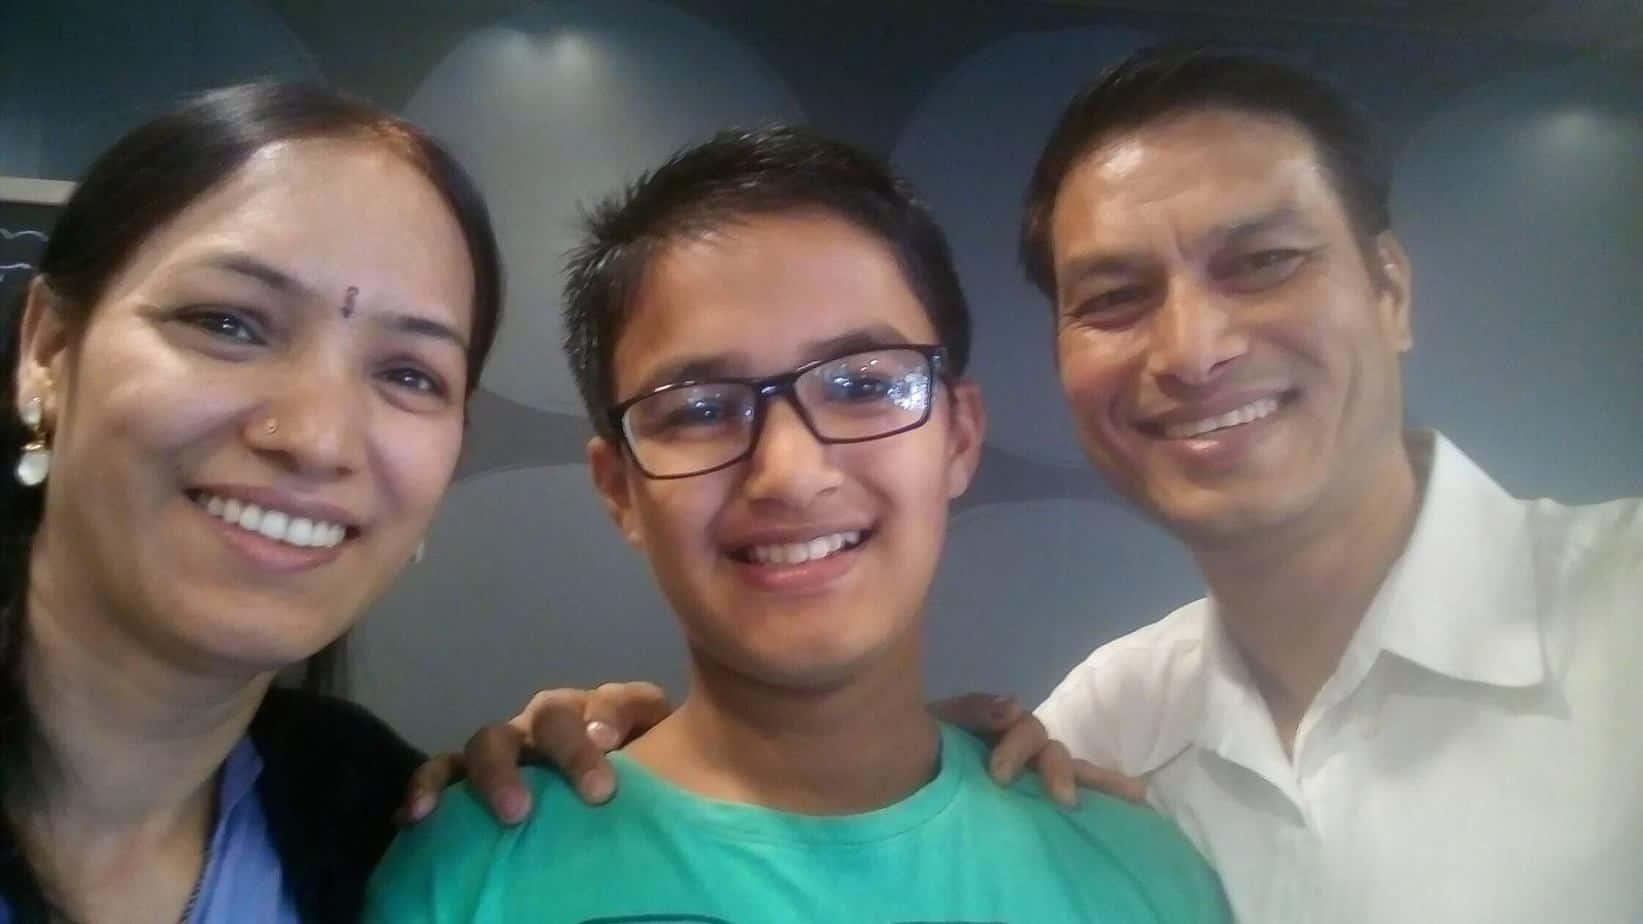 family - Fee-only Advisor Journey: Chandan Singh Padiyar finds Inner Peace